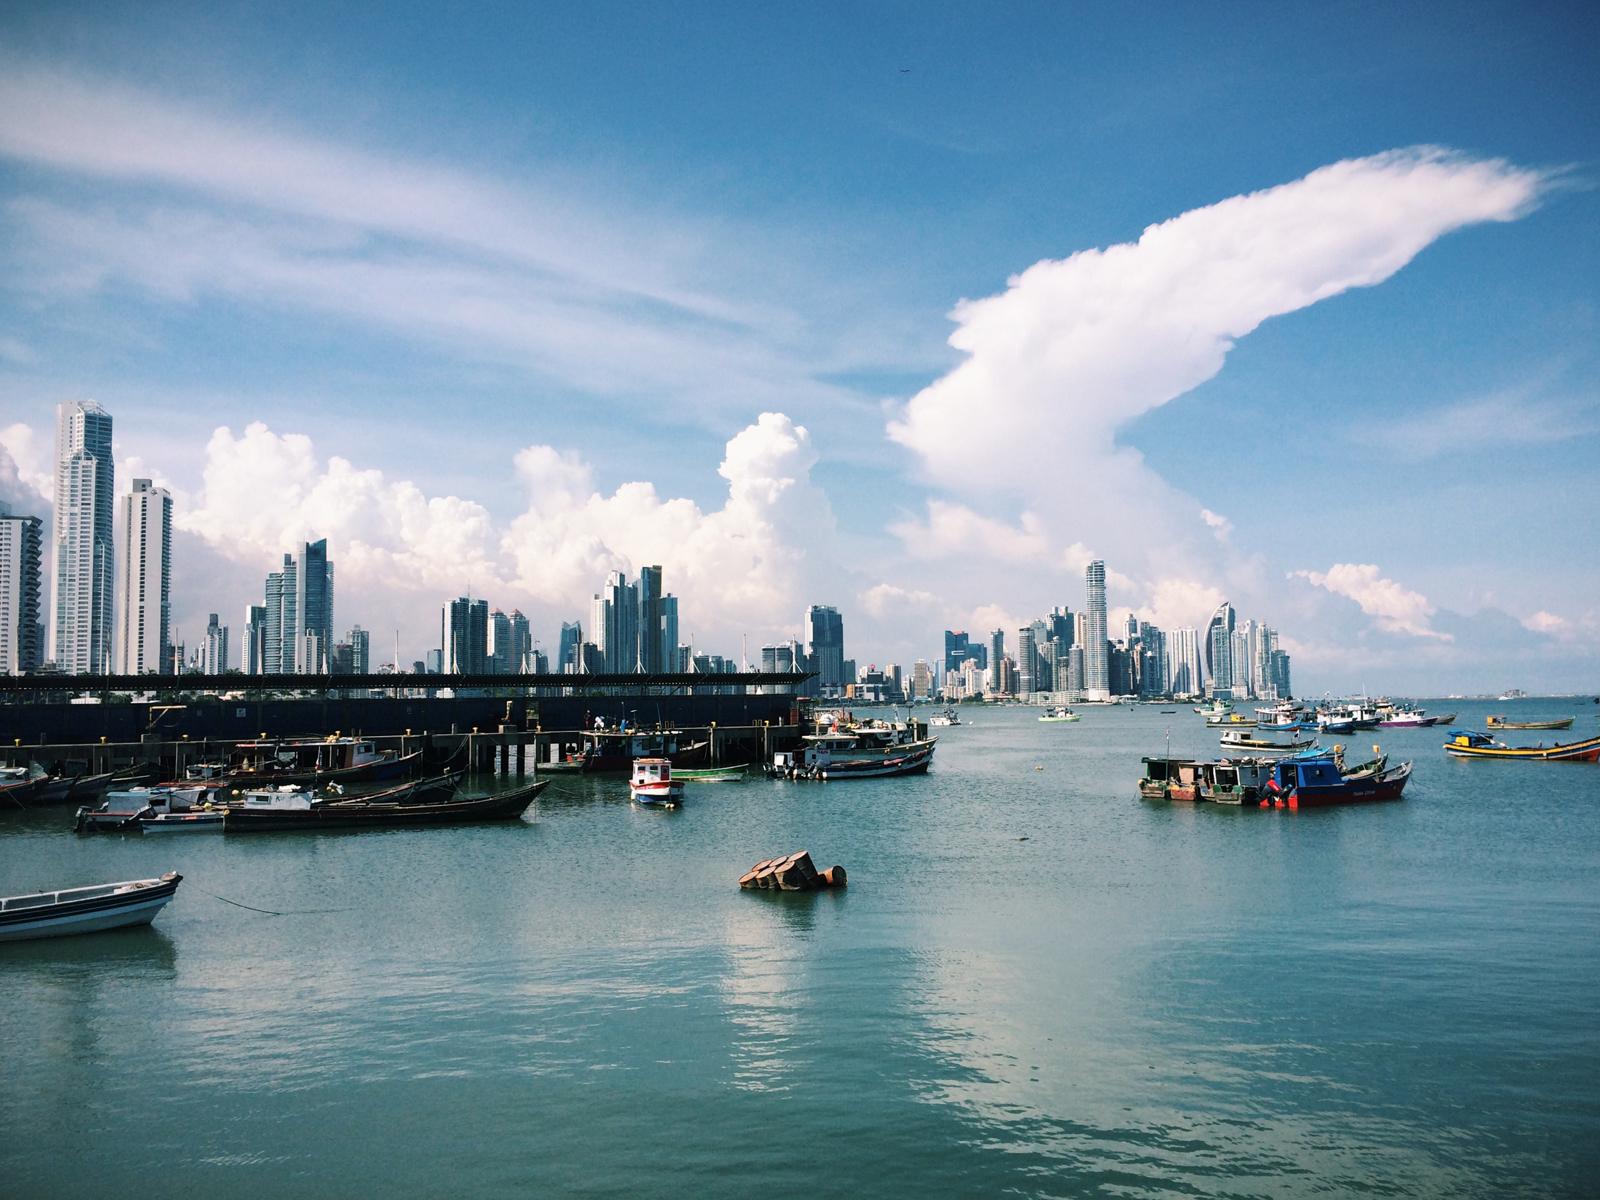 Fish market + Panama City skyline